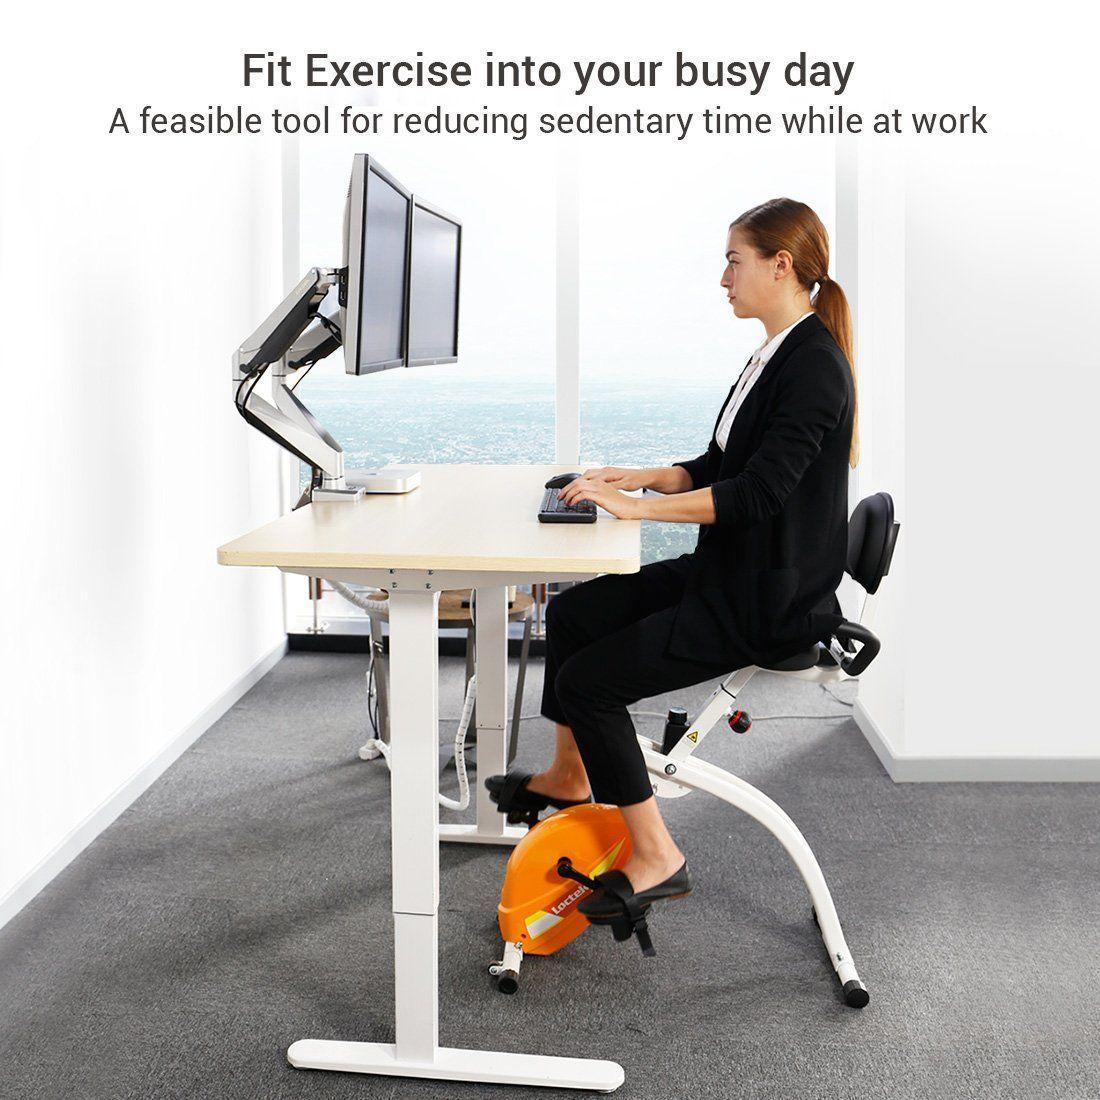 Height Of Standing Desk Biking Workout Foldable Exercise Bike Desk Workout